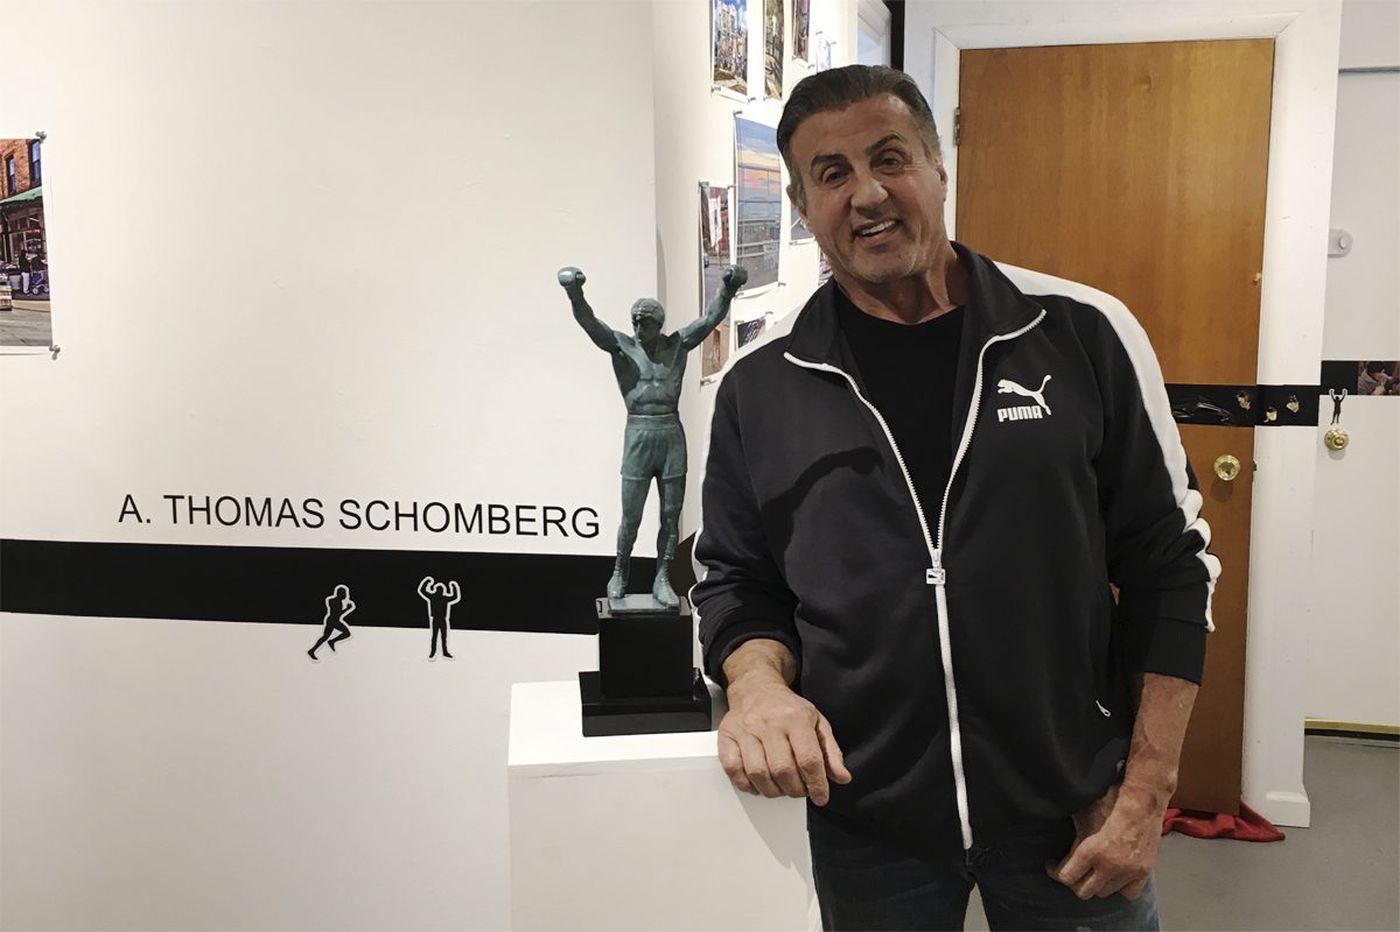 Sylvester Stallone visits 'Rocky' art exhibit